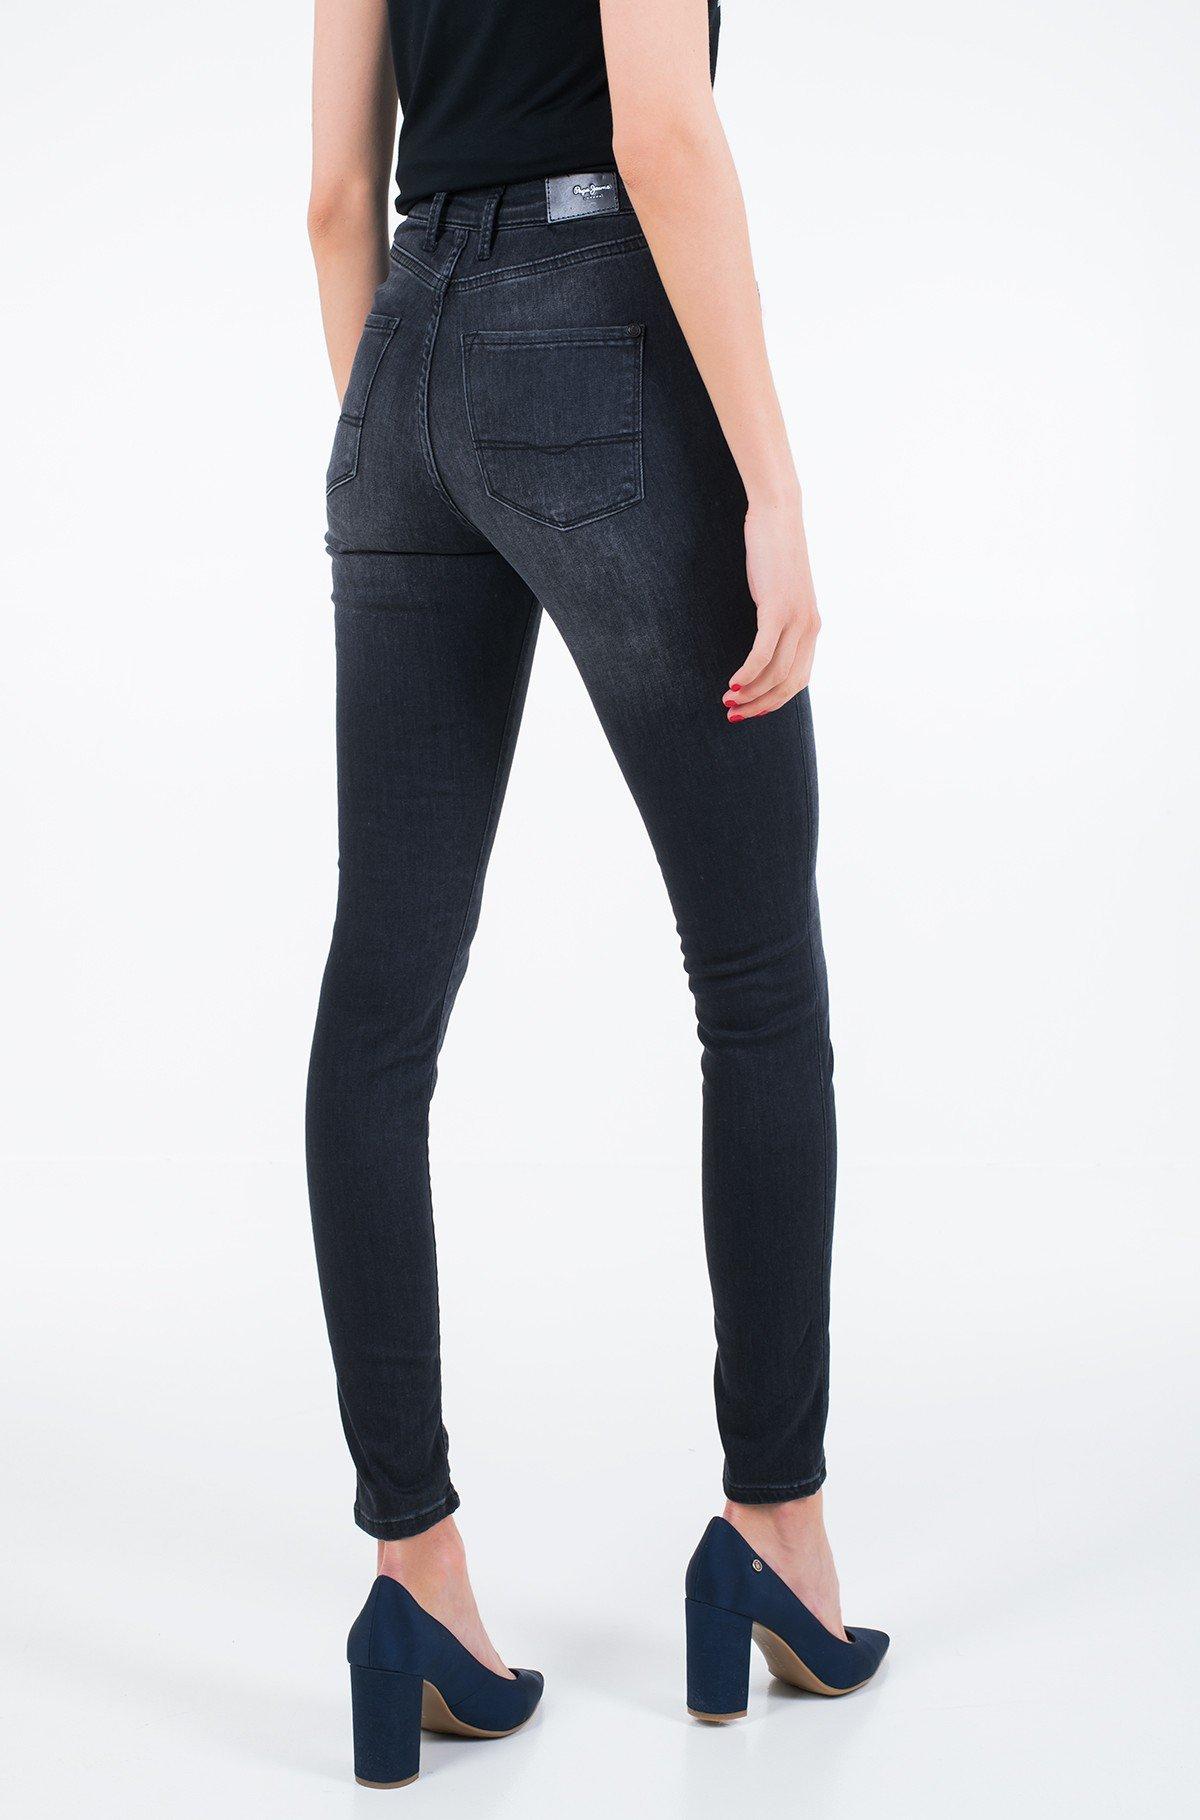 Jeans DION/PL202285XA3-full-2